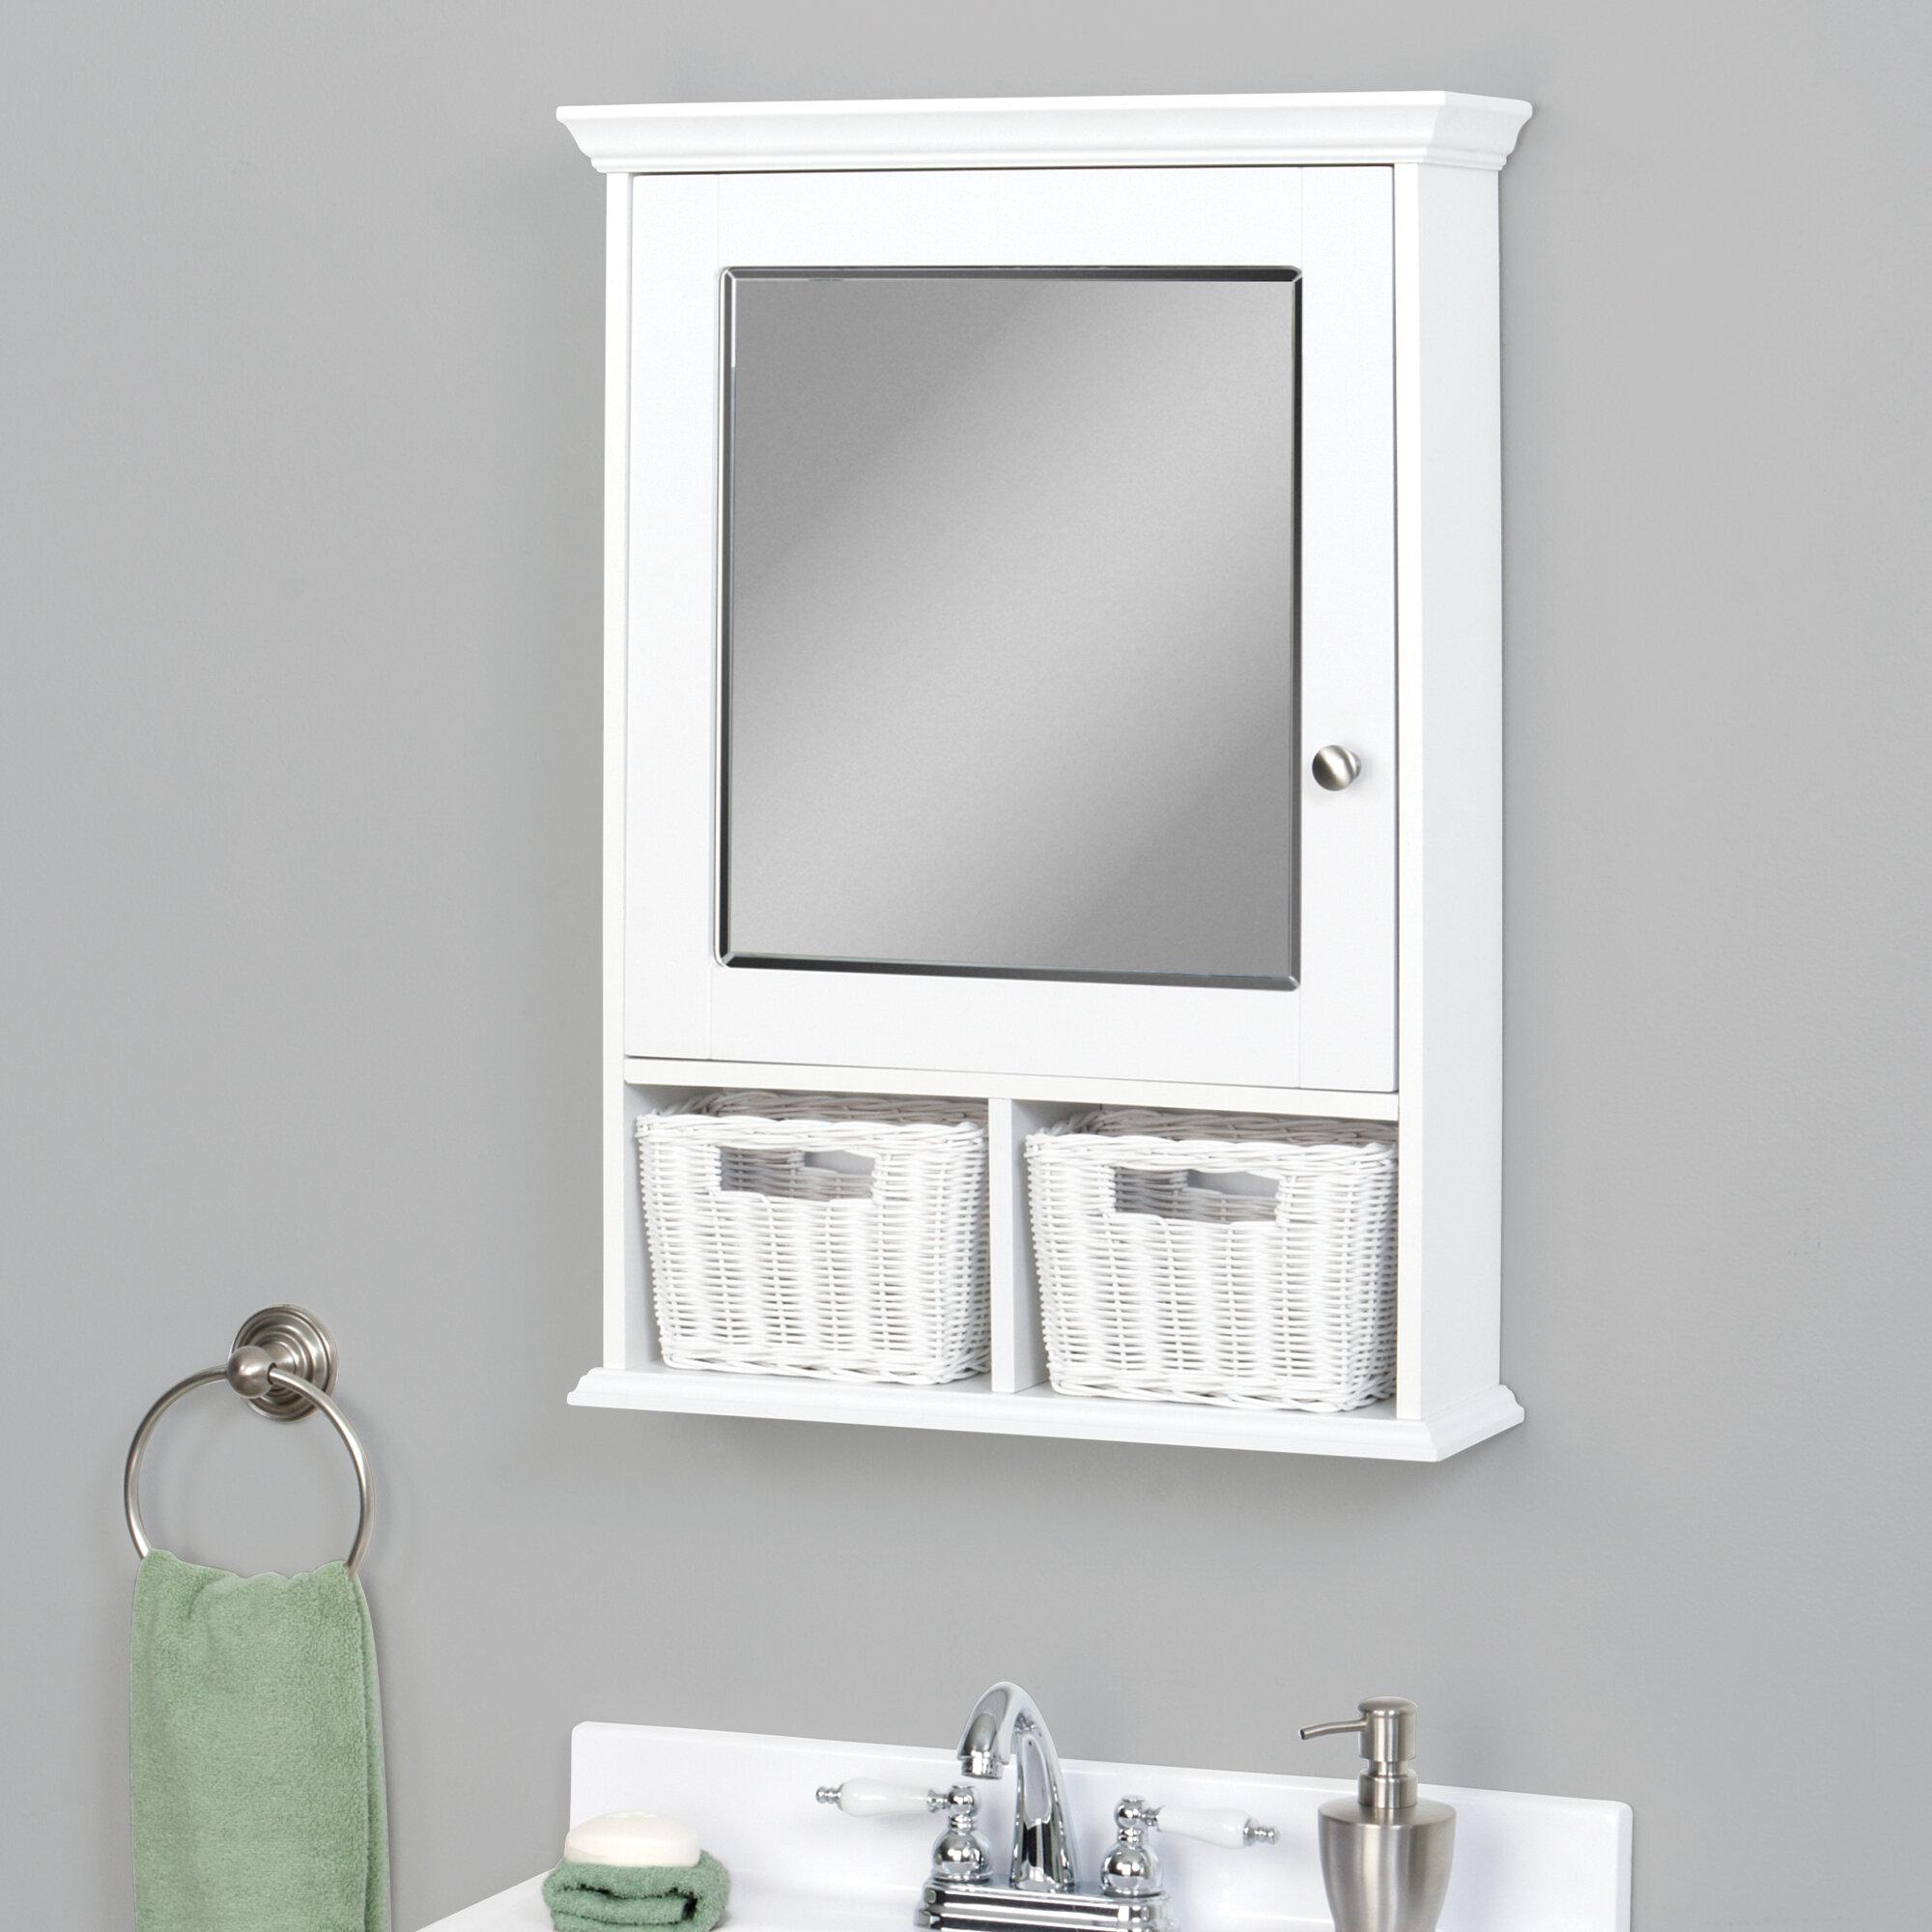 Zenith Surface Mount Framed Medicine Cabinet With 2 Adjustable Shelves Reviews Wayfair